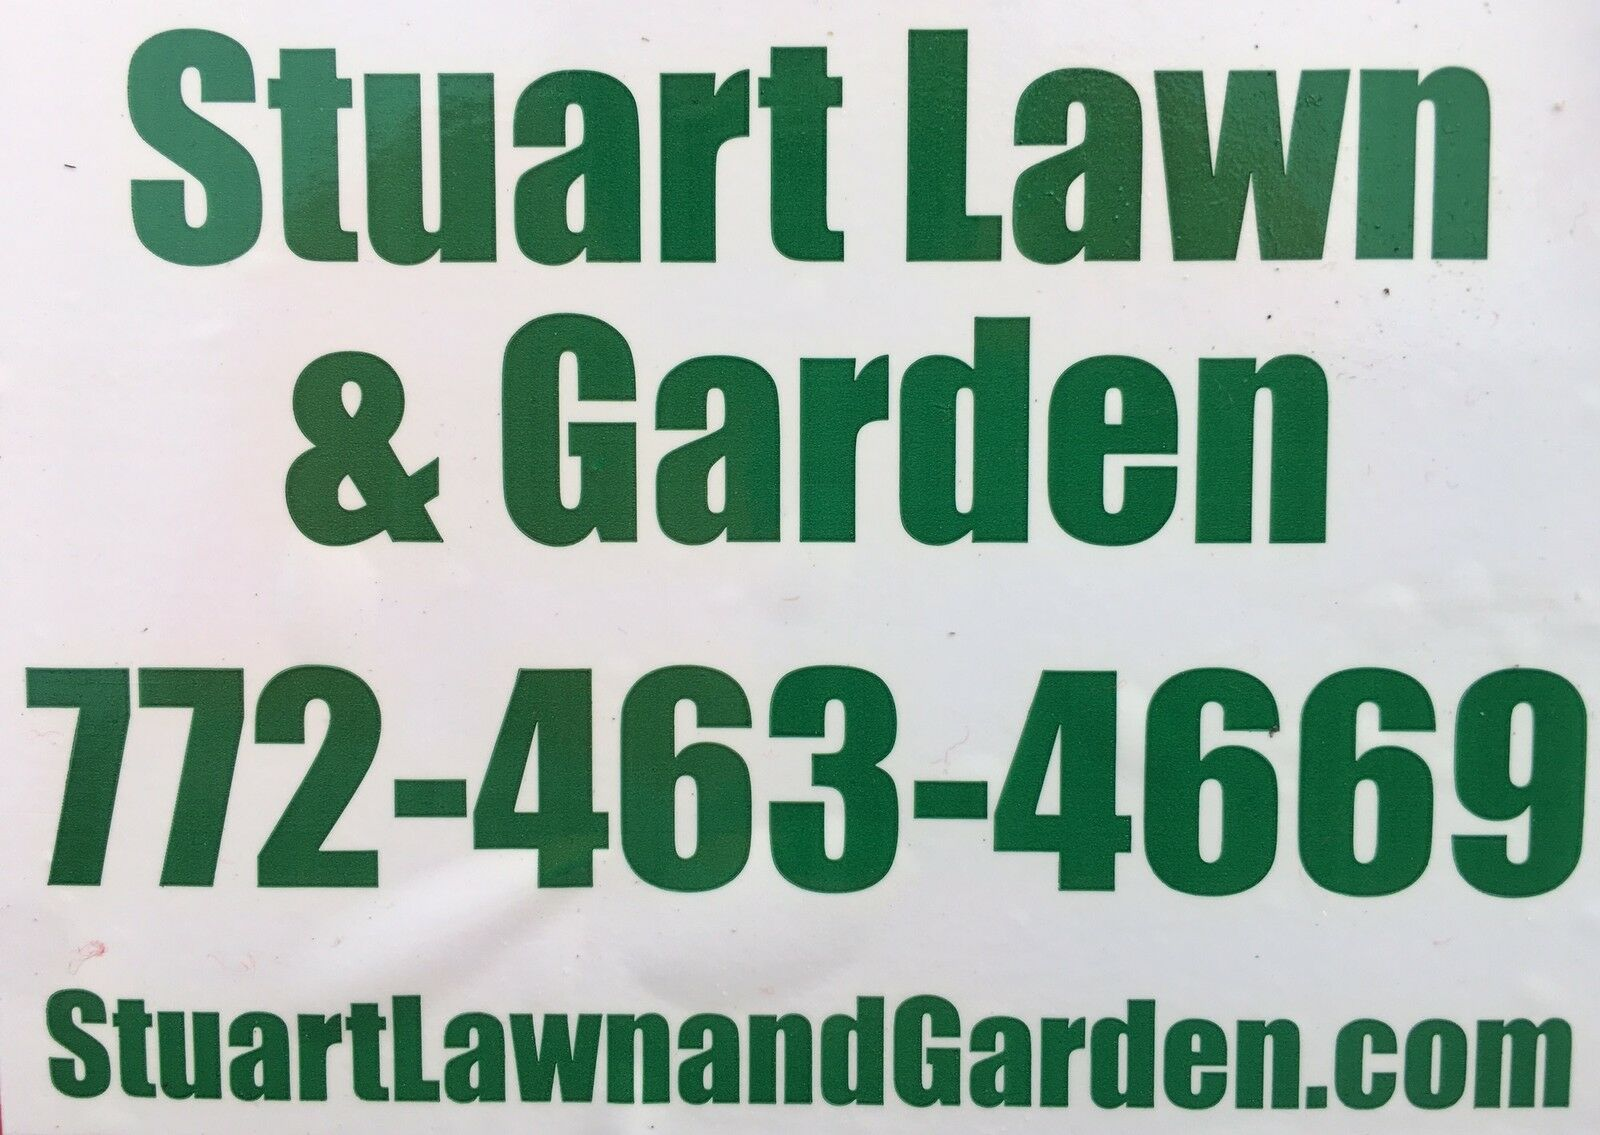 Stuart Lawn and Garden